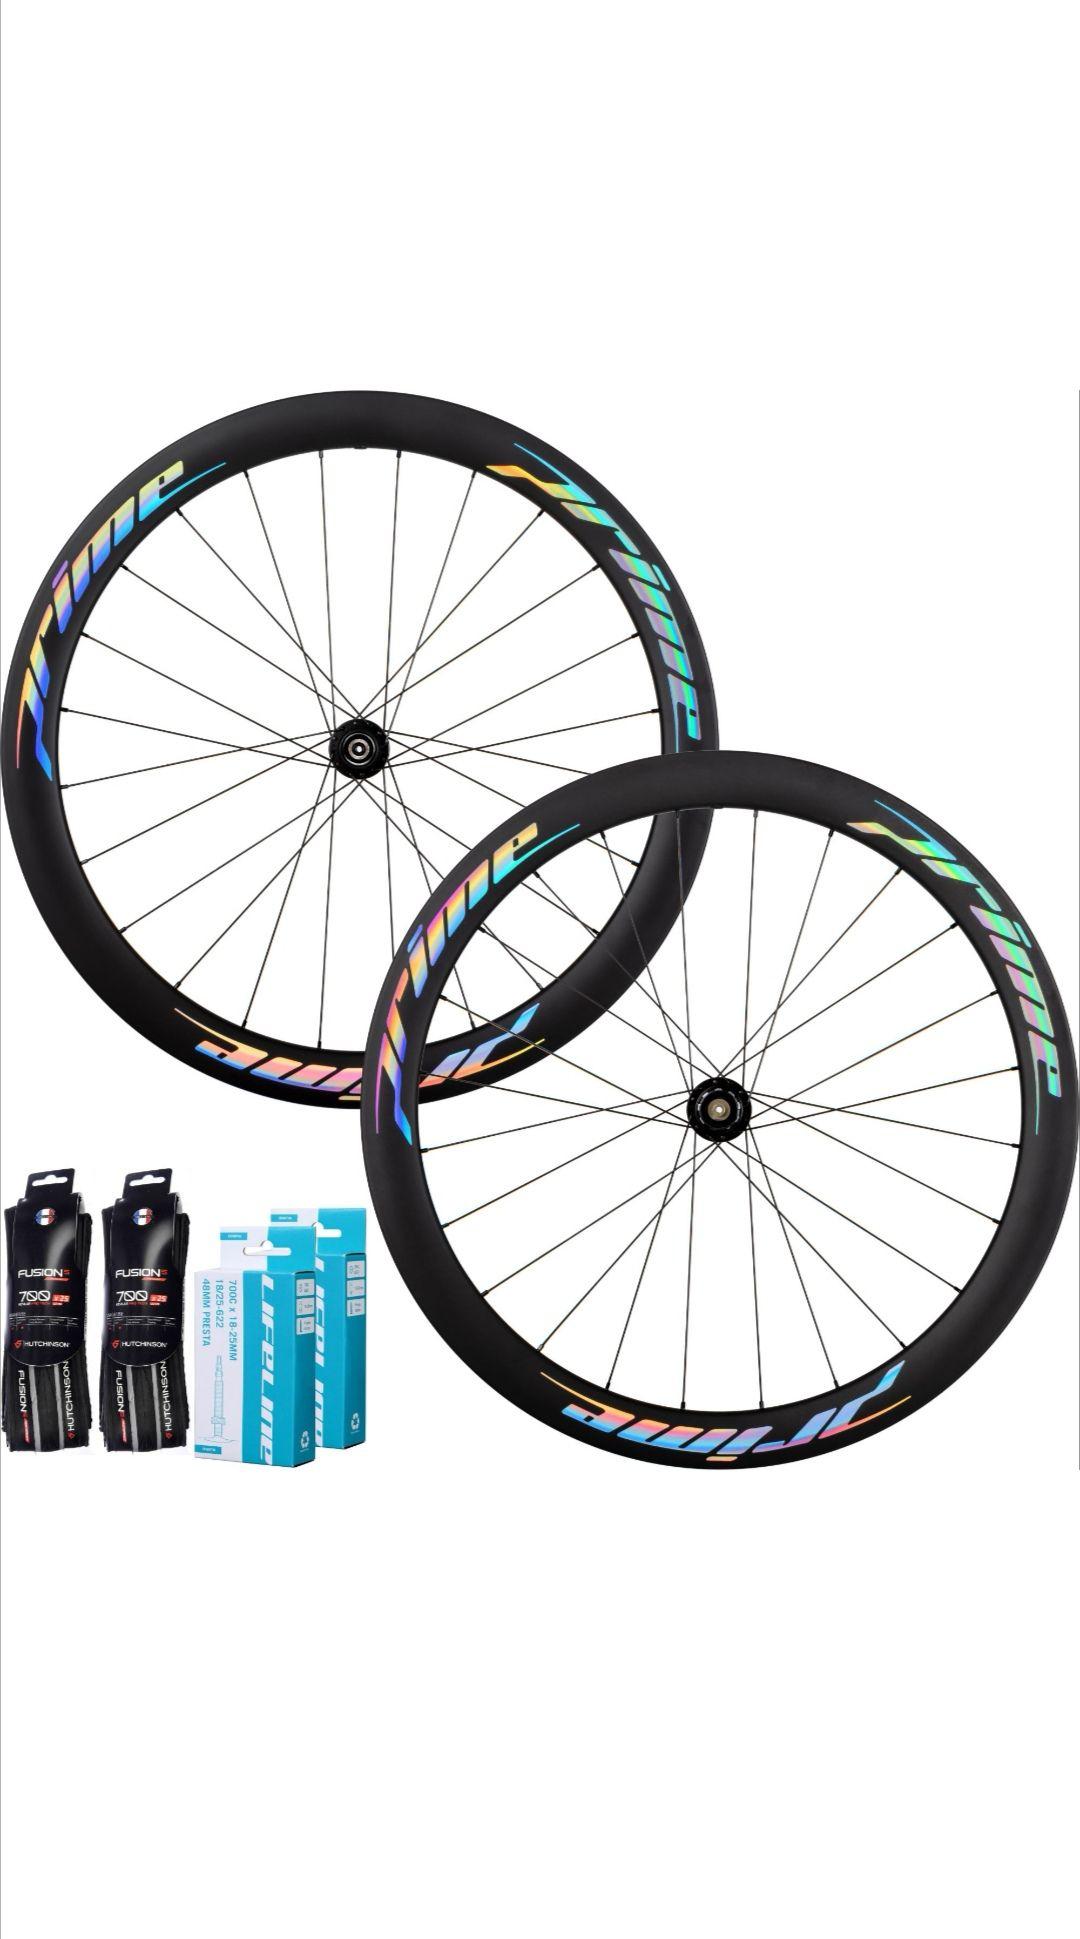 Prime RR-50 SE Carbon Clincher Disc Wheelset £449.99 at Chain Reaction Cycles